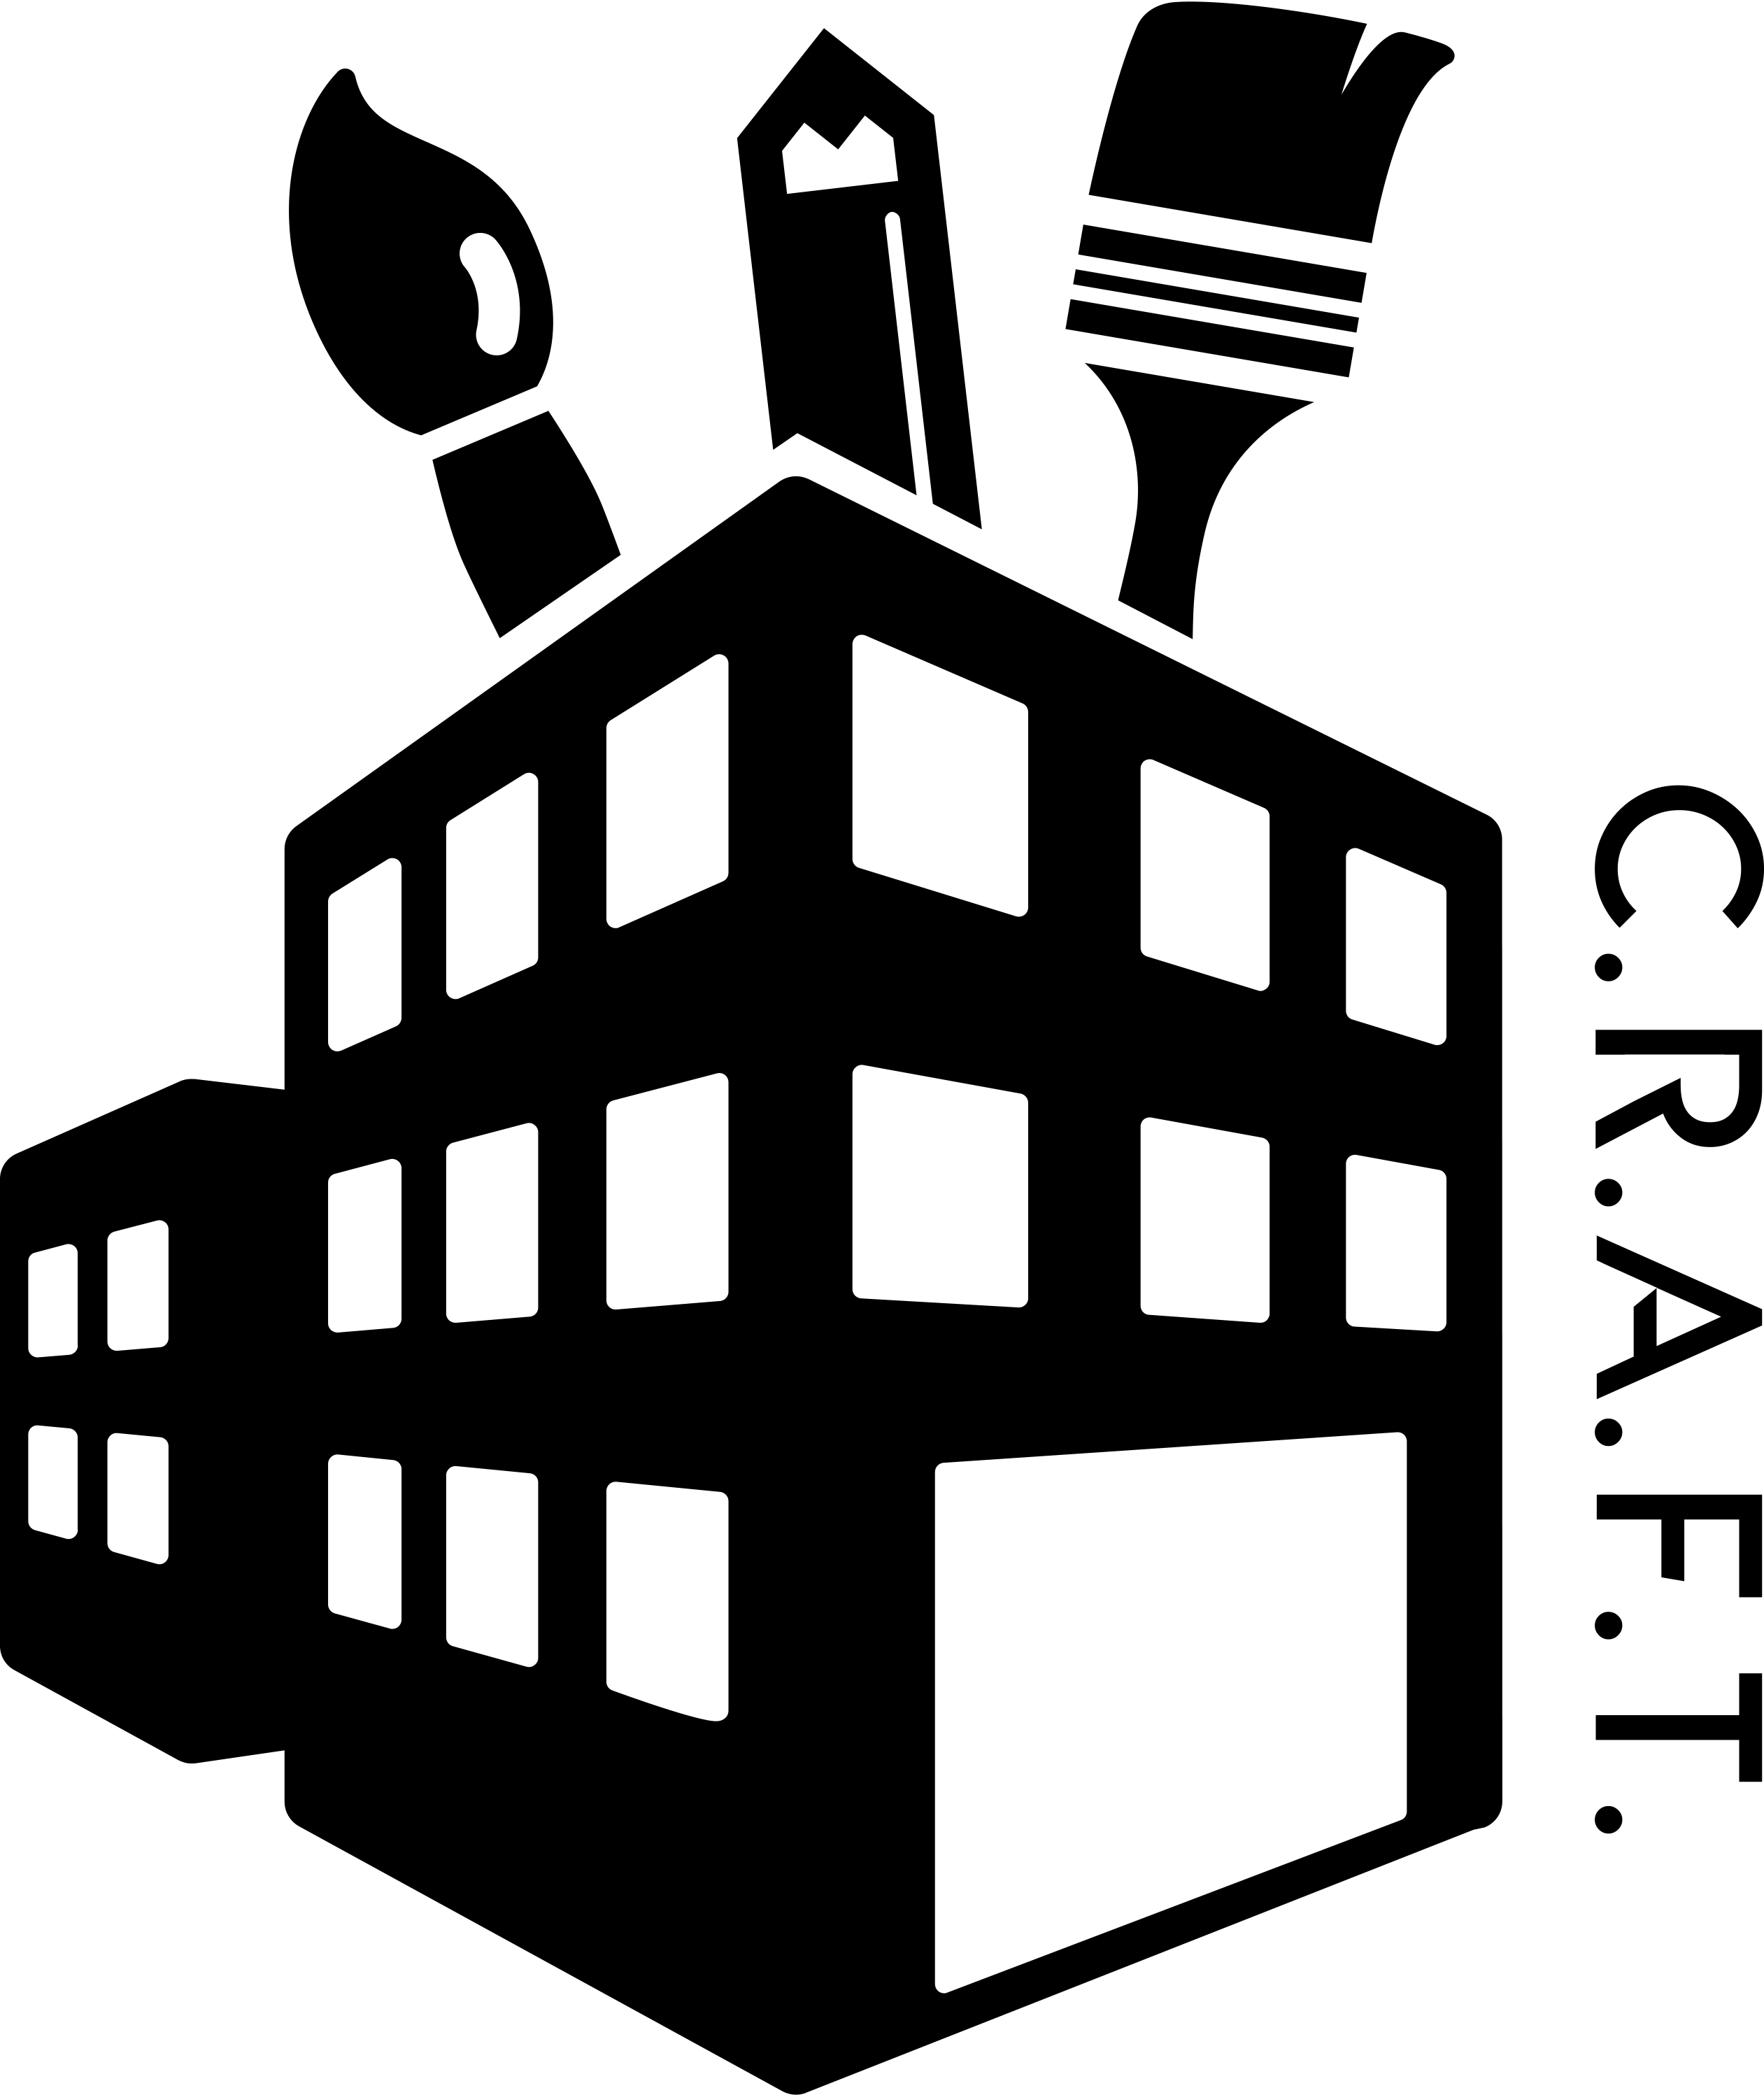 C.R.A.F.T Building Logo